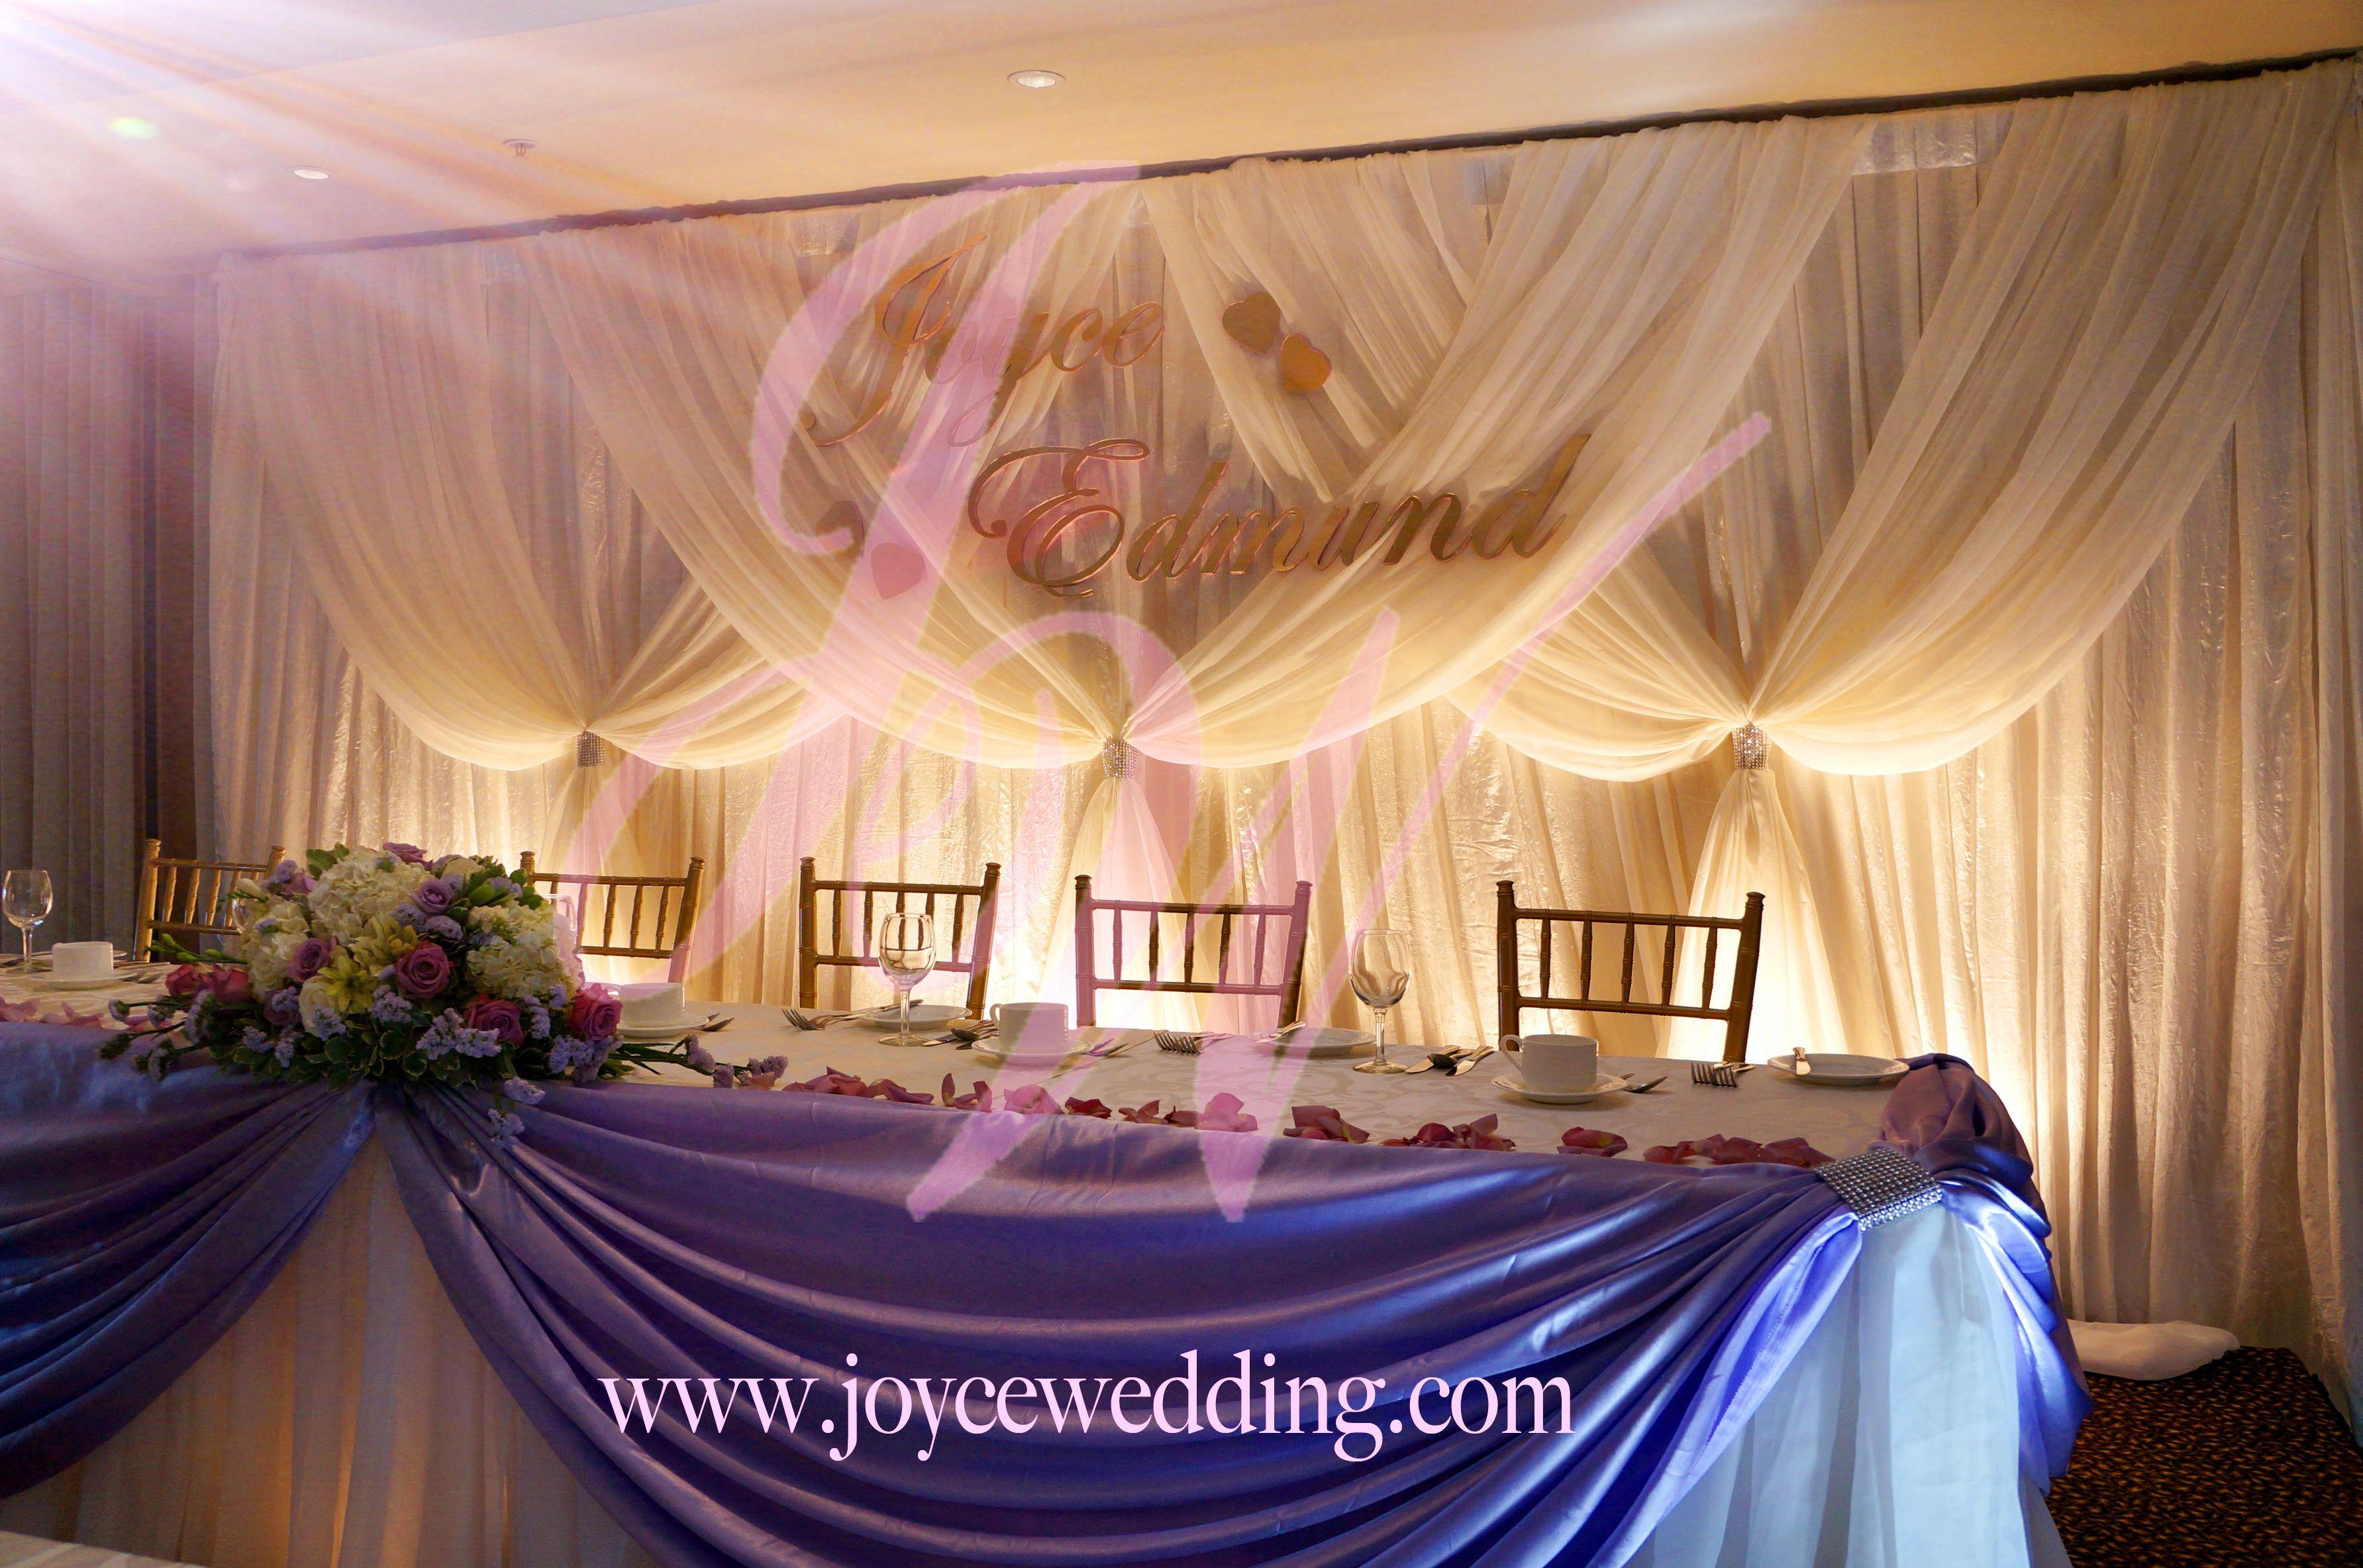 Reception Backdrop Ideas Joyce Wedding Services Service Provides One Stop